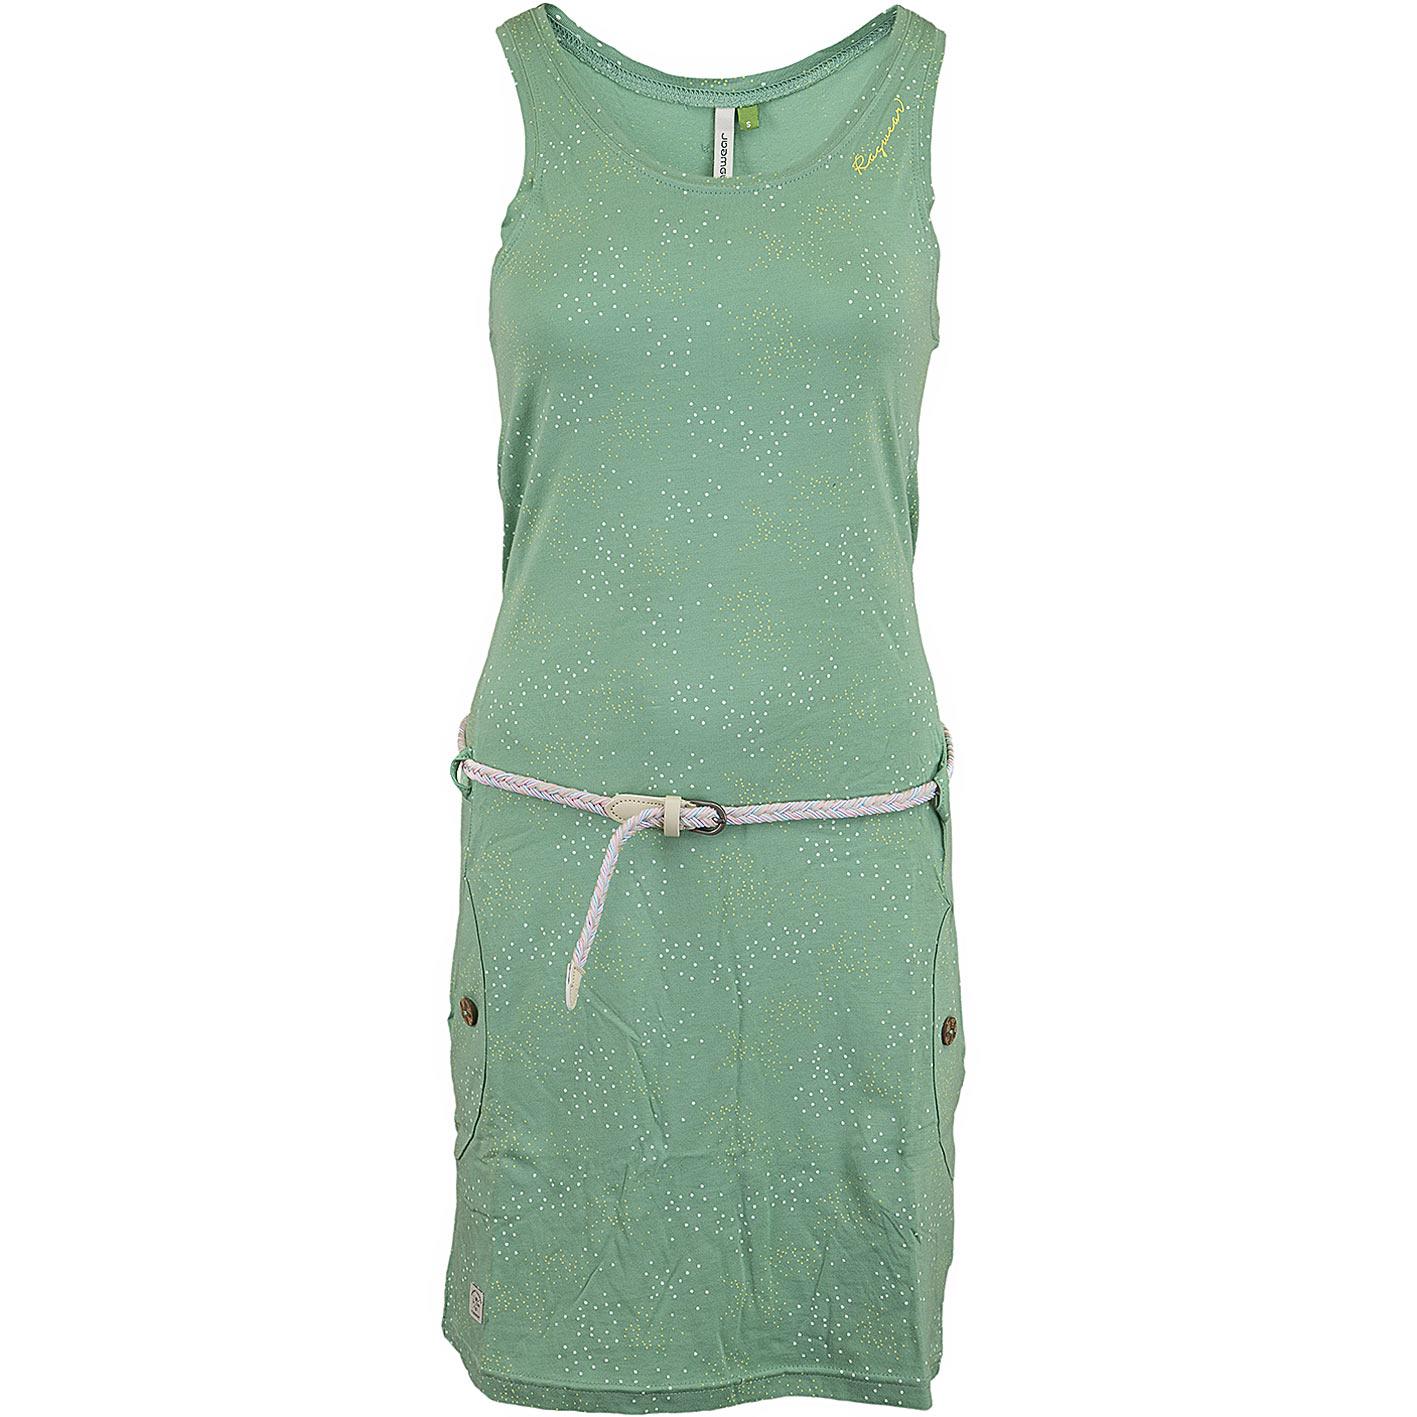 Ragwear Kleid Kesy A Organic grün - hier bestellen!